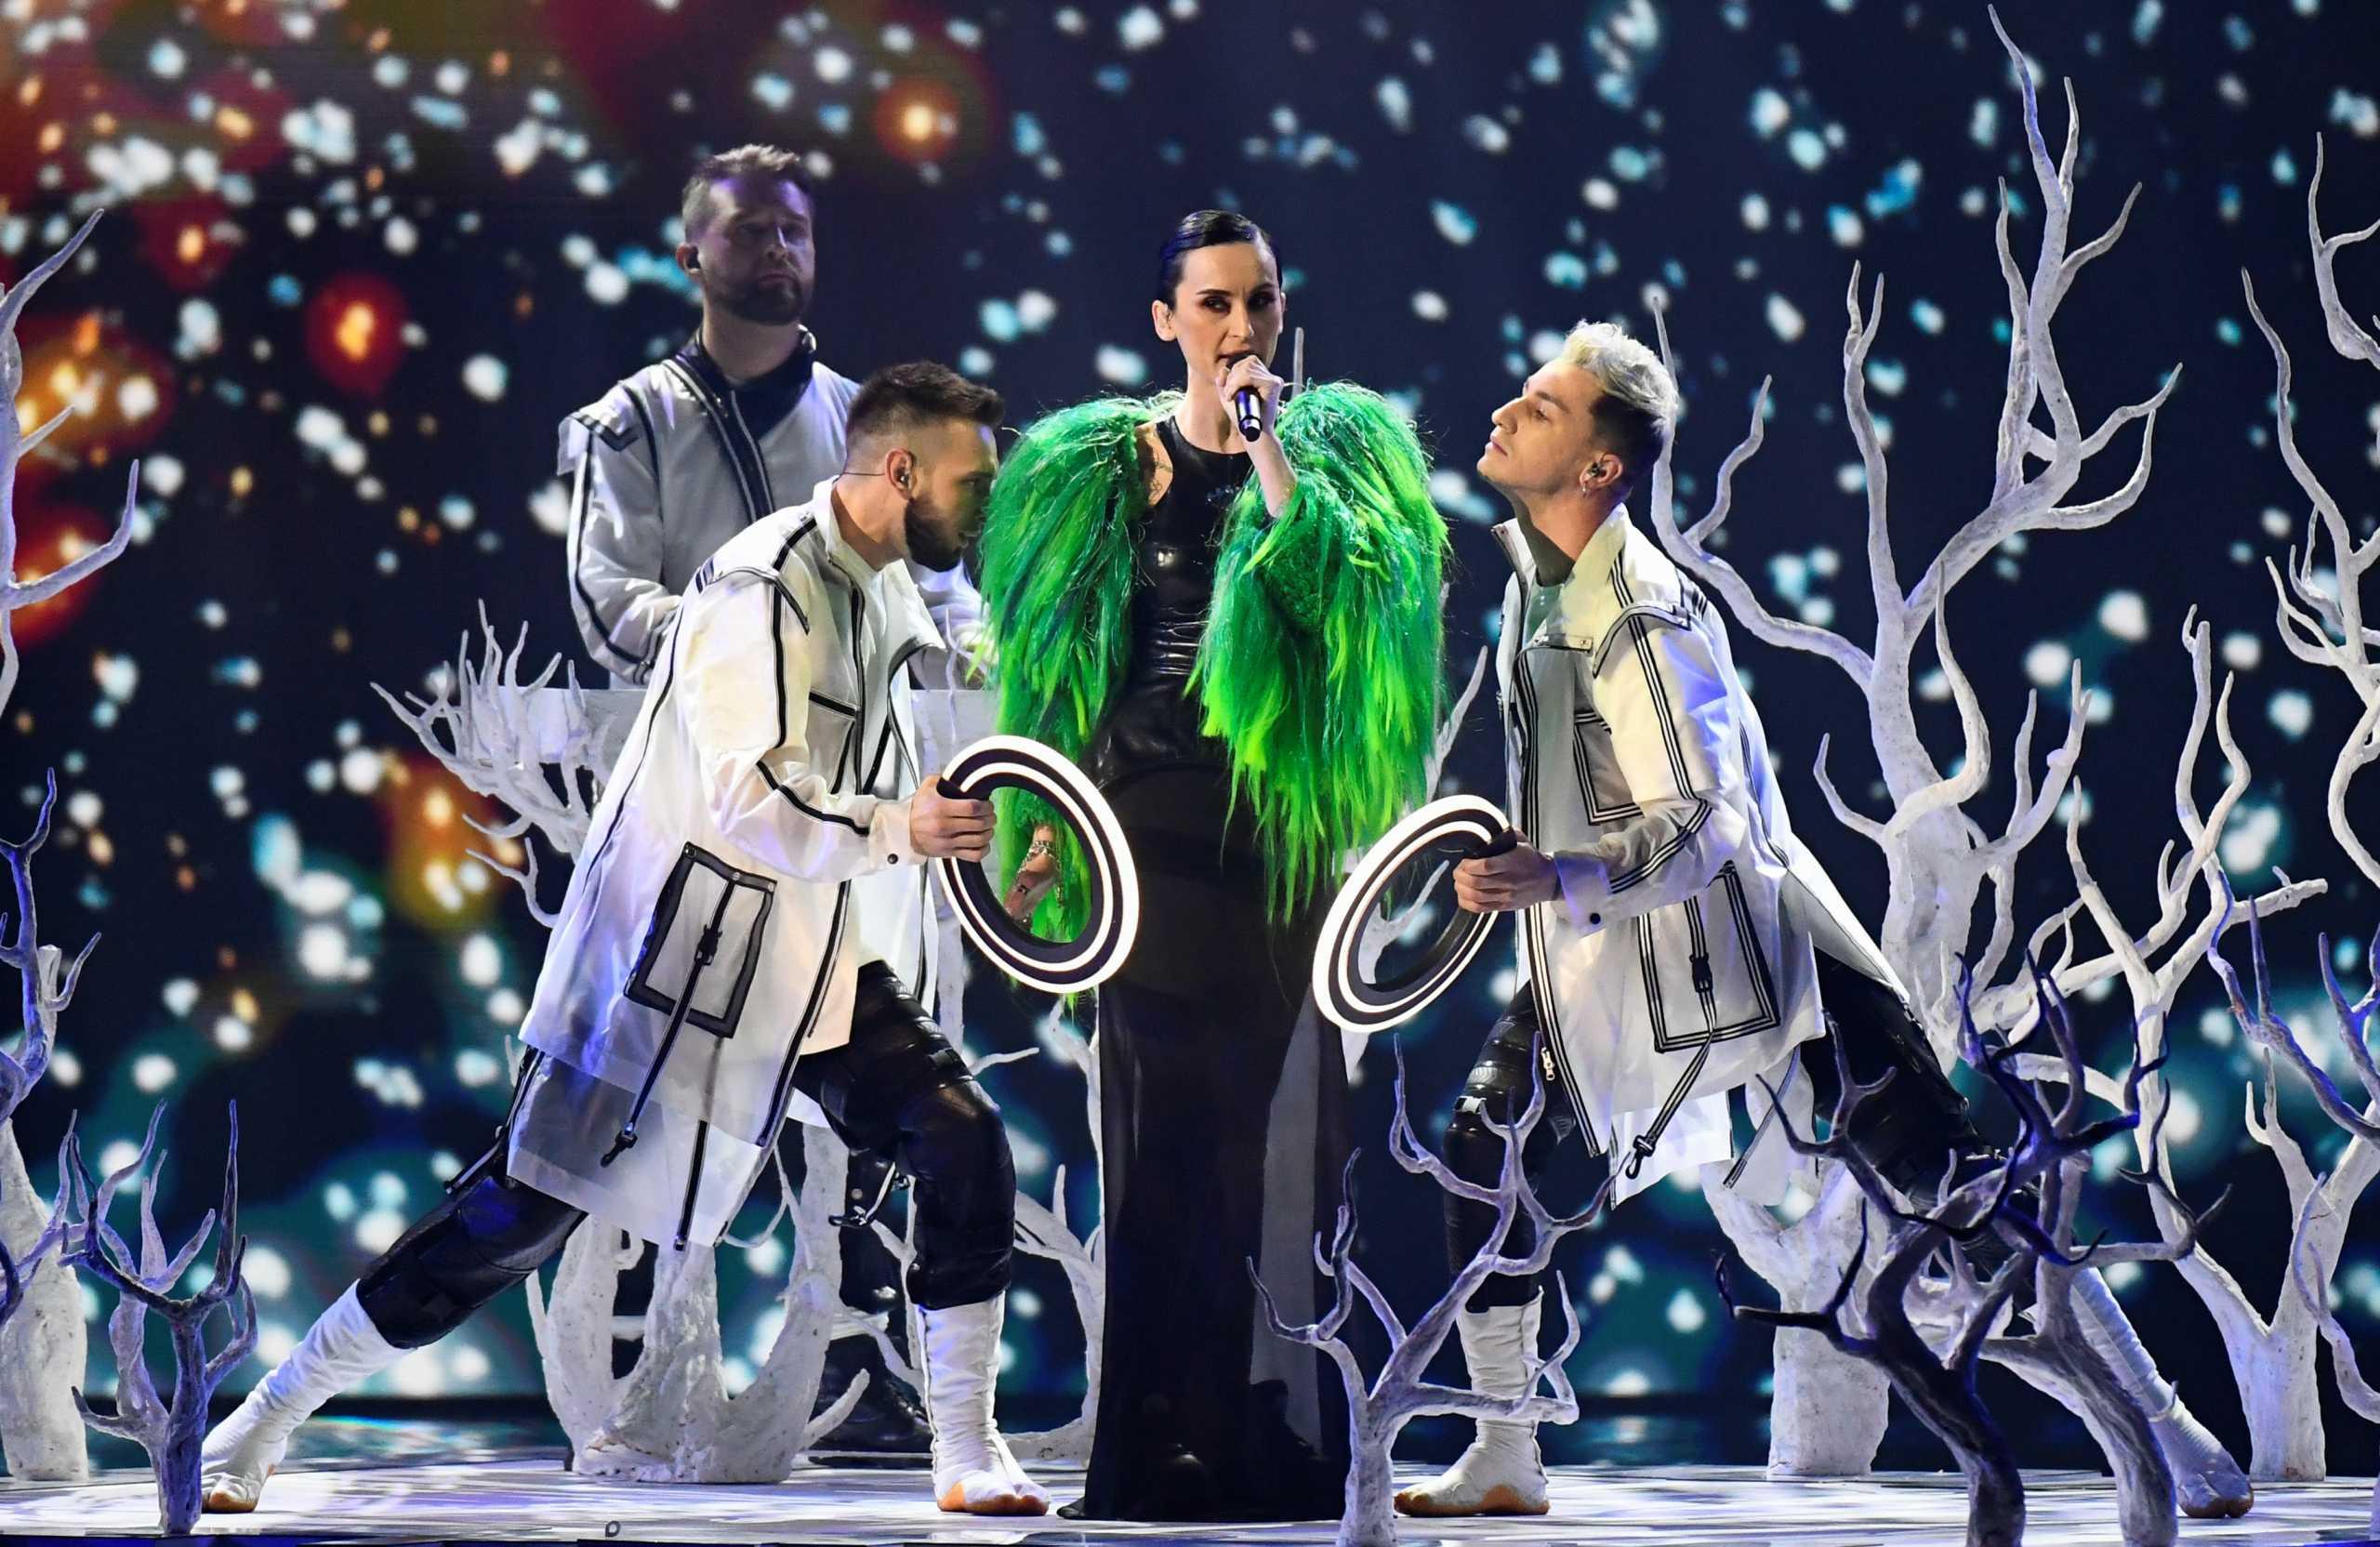 Eurovision 2021: 8 πράγματα που δεν ξέραμε για τον διαγωνισμό